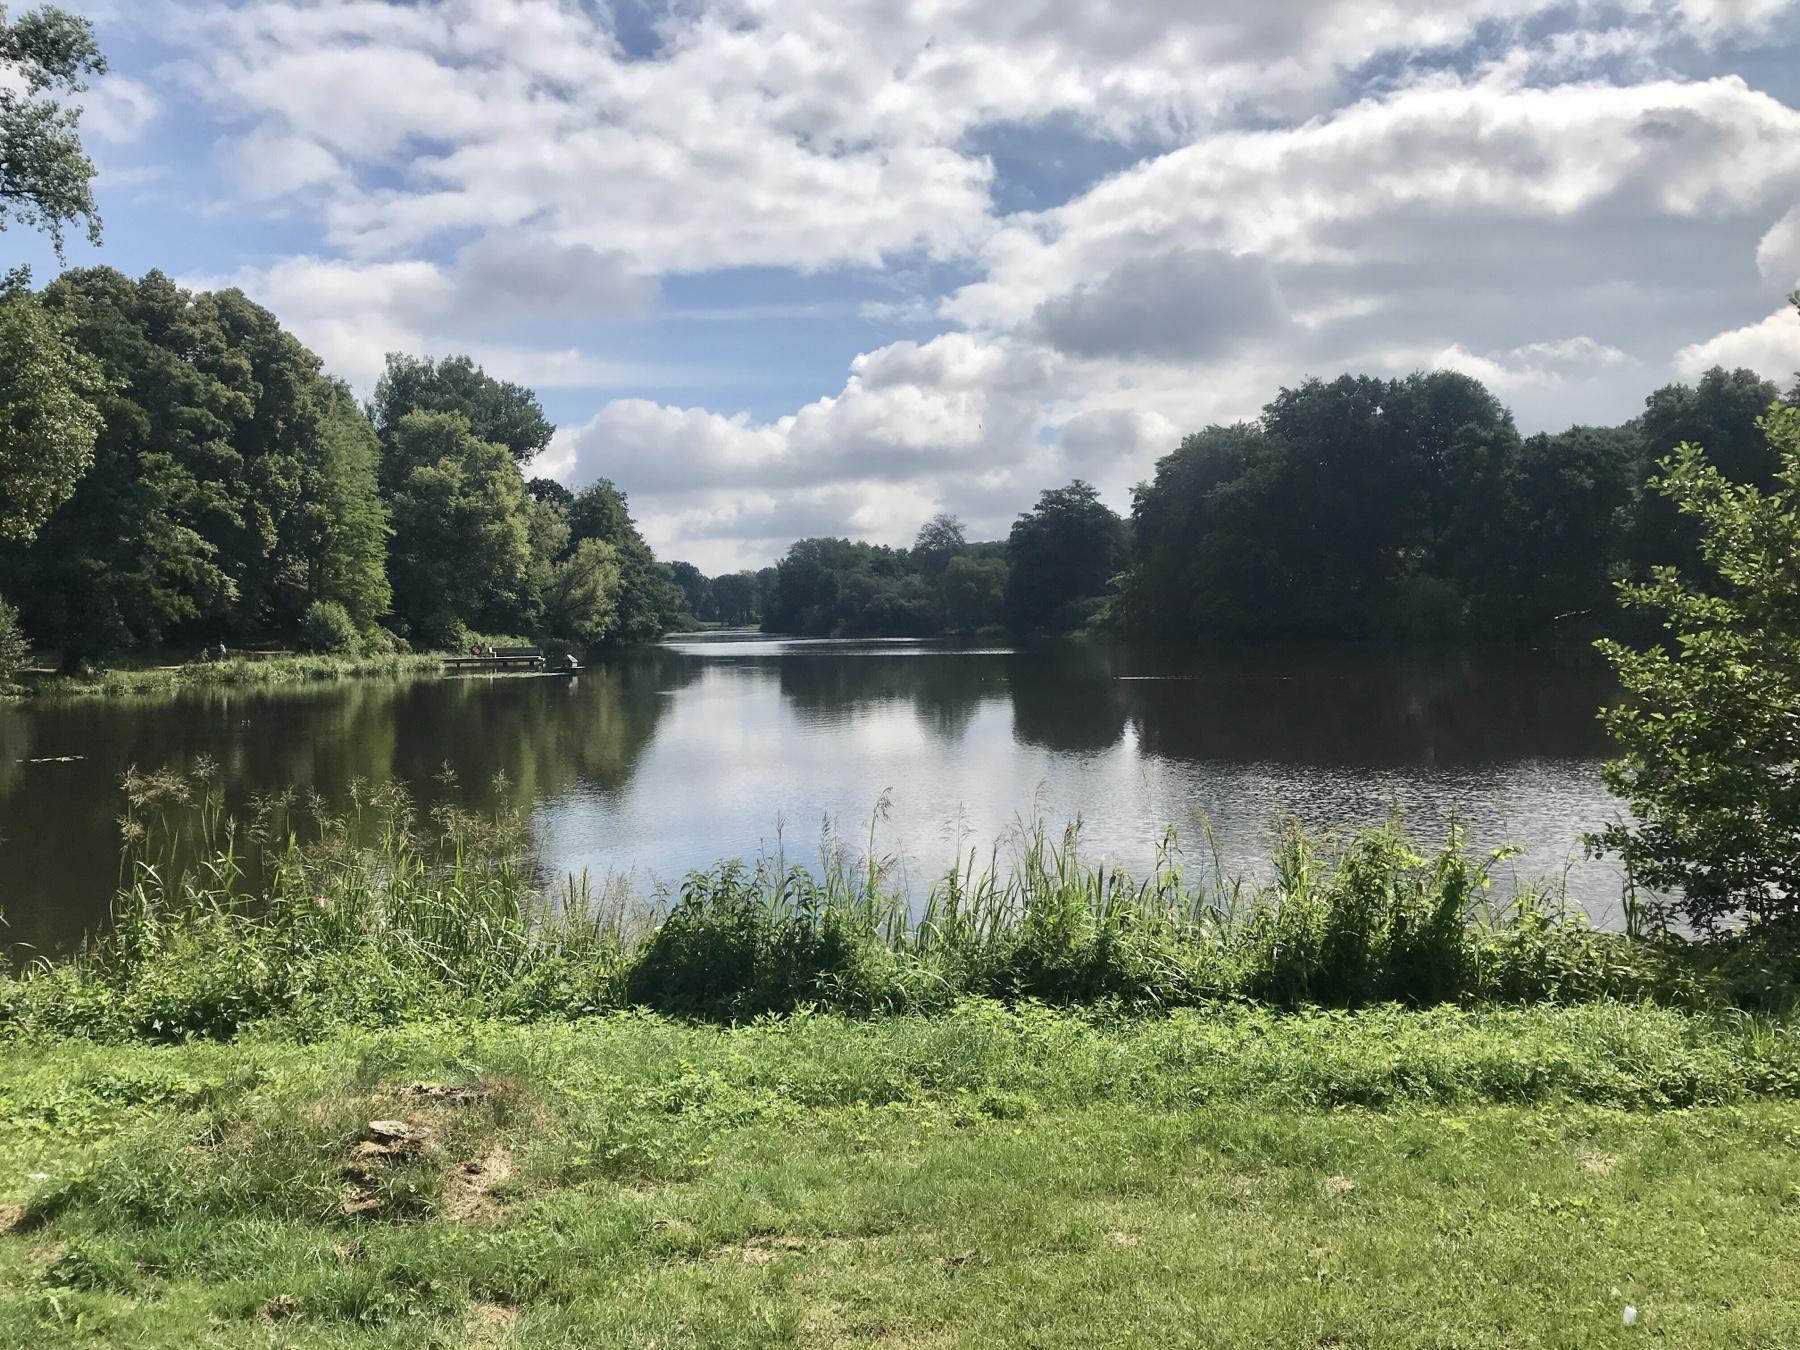 Reinbeker Mühlenteich am Schloss, Stormarnweg Etappe 1 Reinbek Großensee